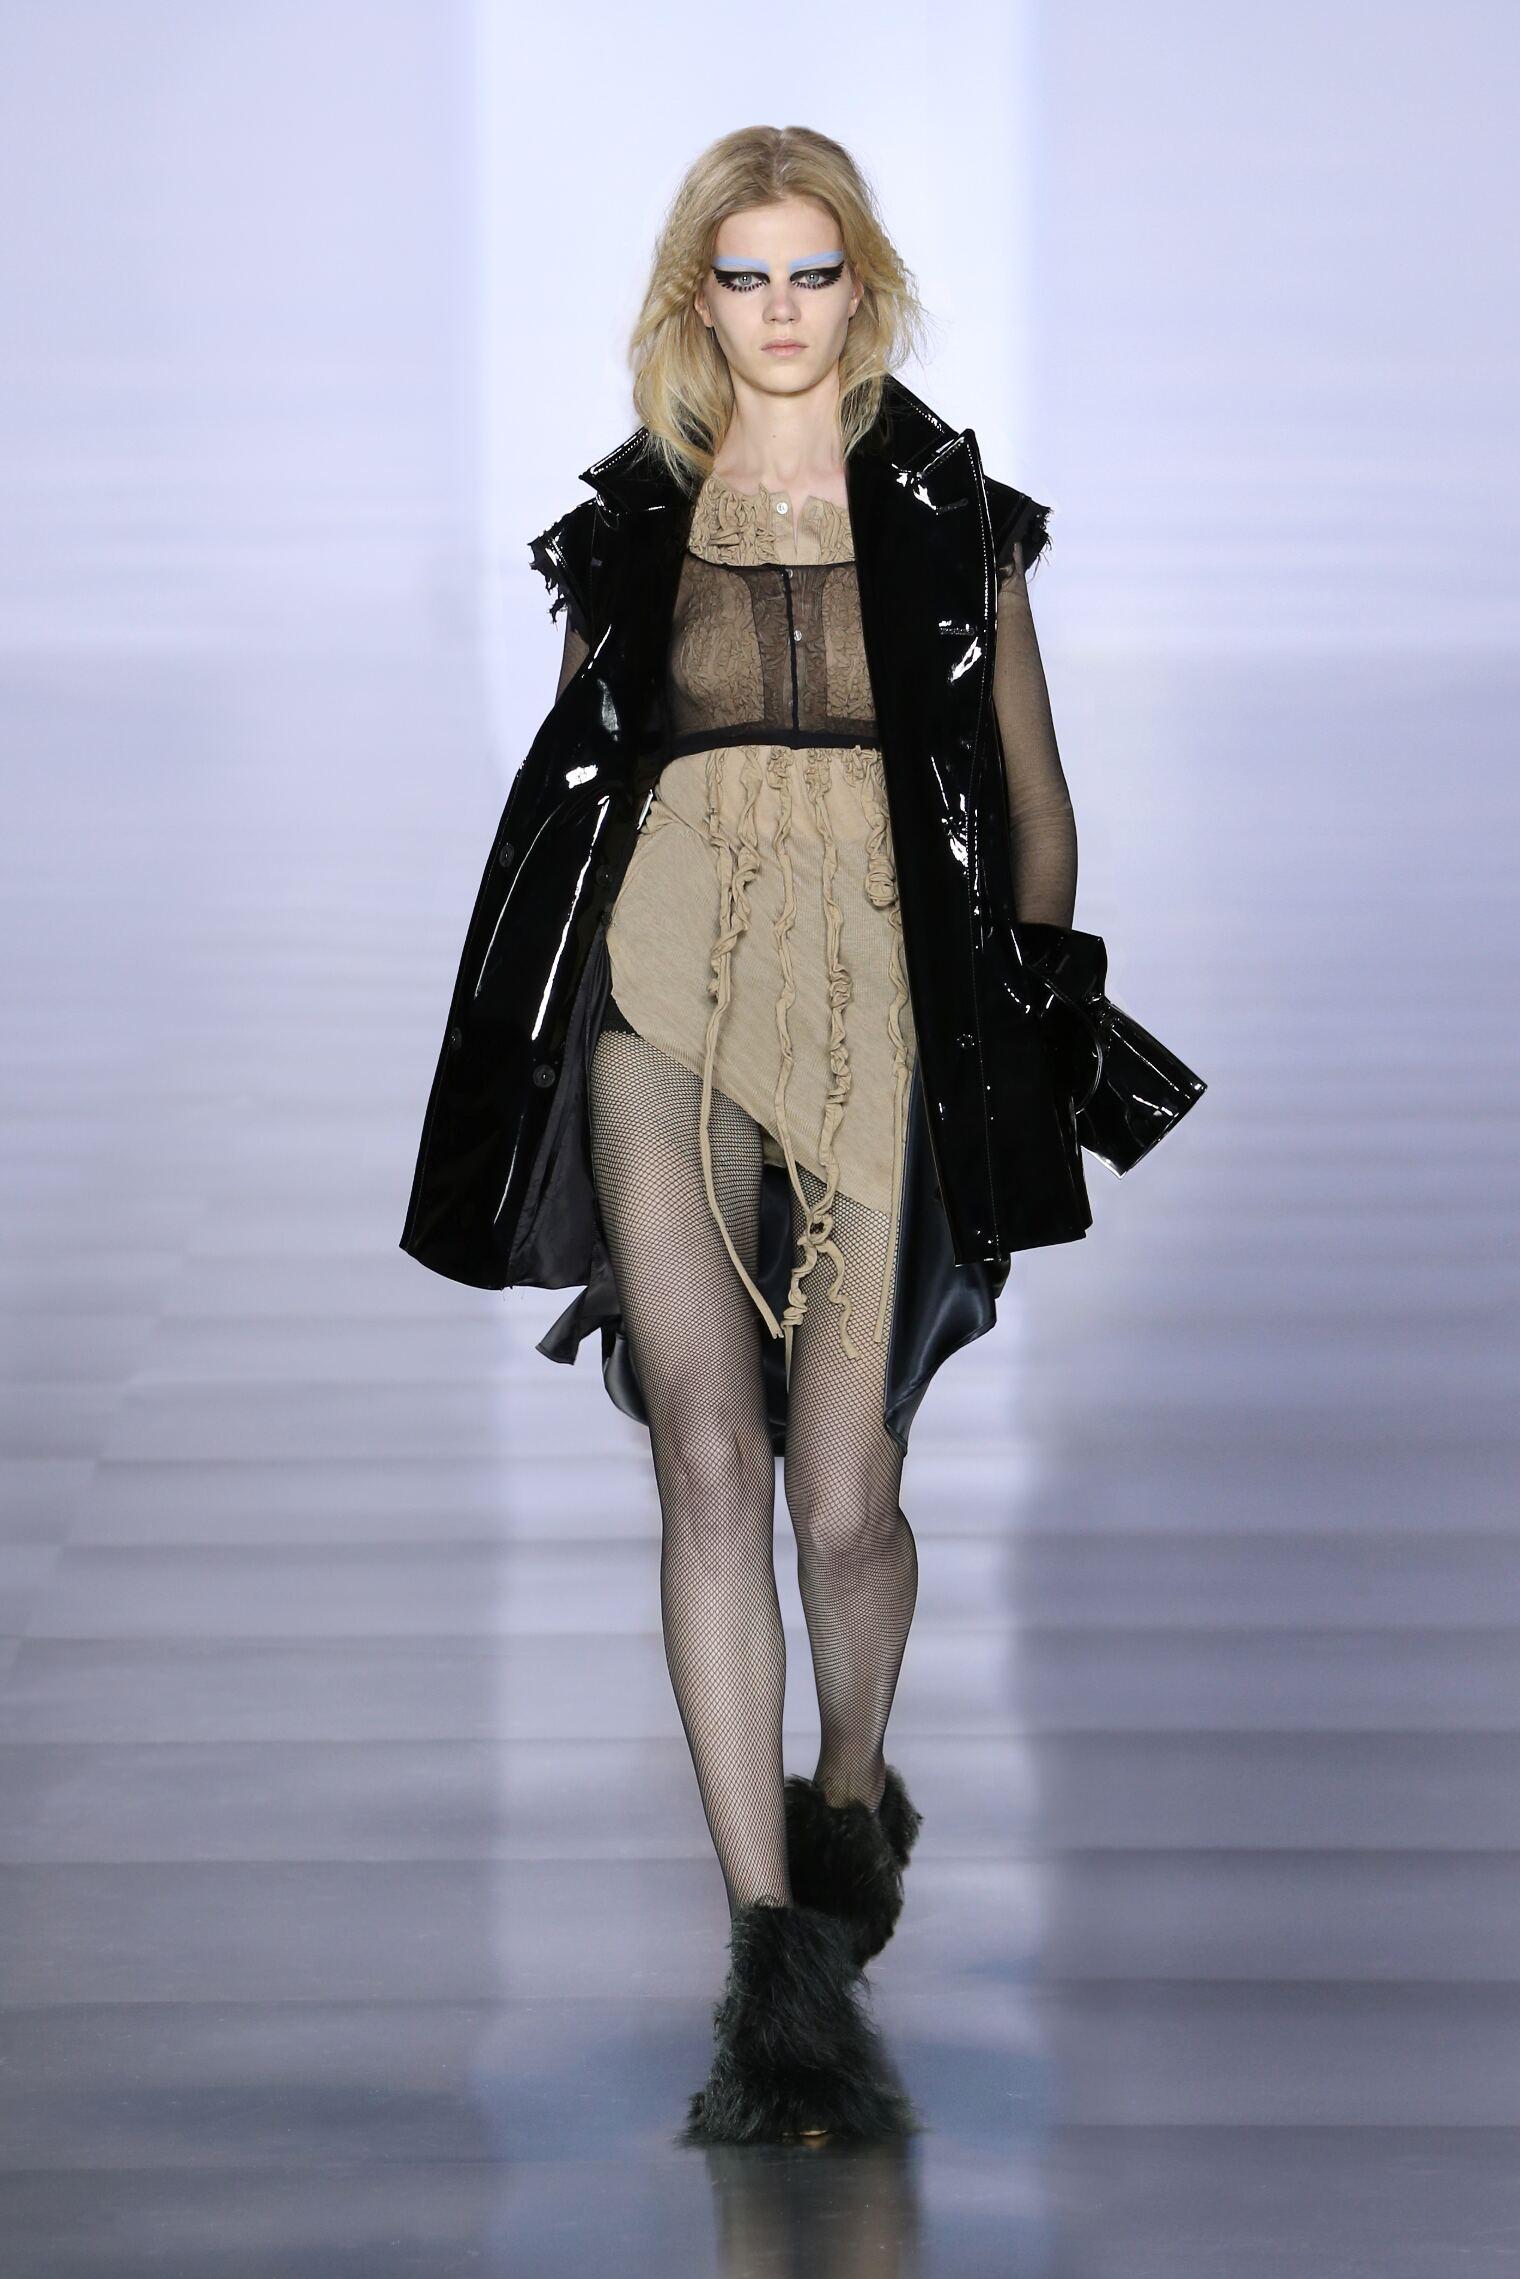 2015 Fashion Woman Model Maison Margiela Collection Catwalk